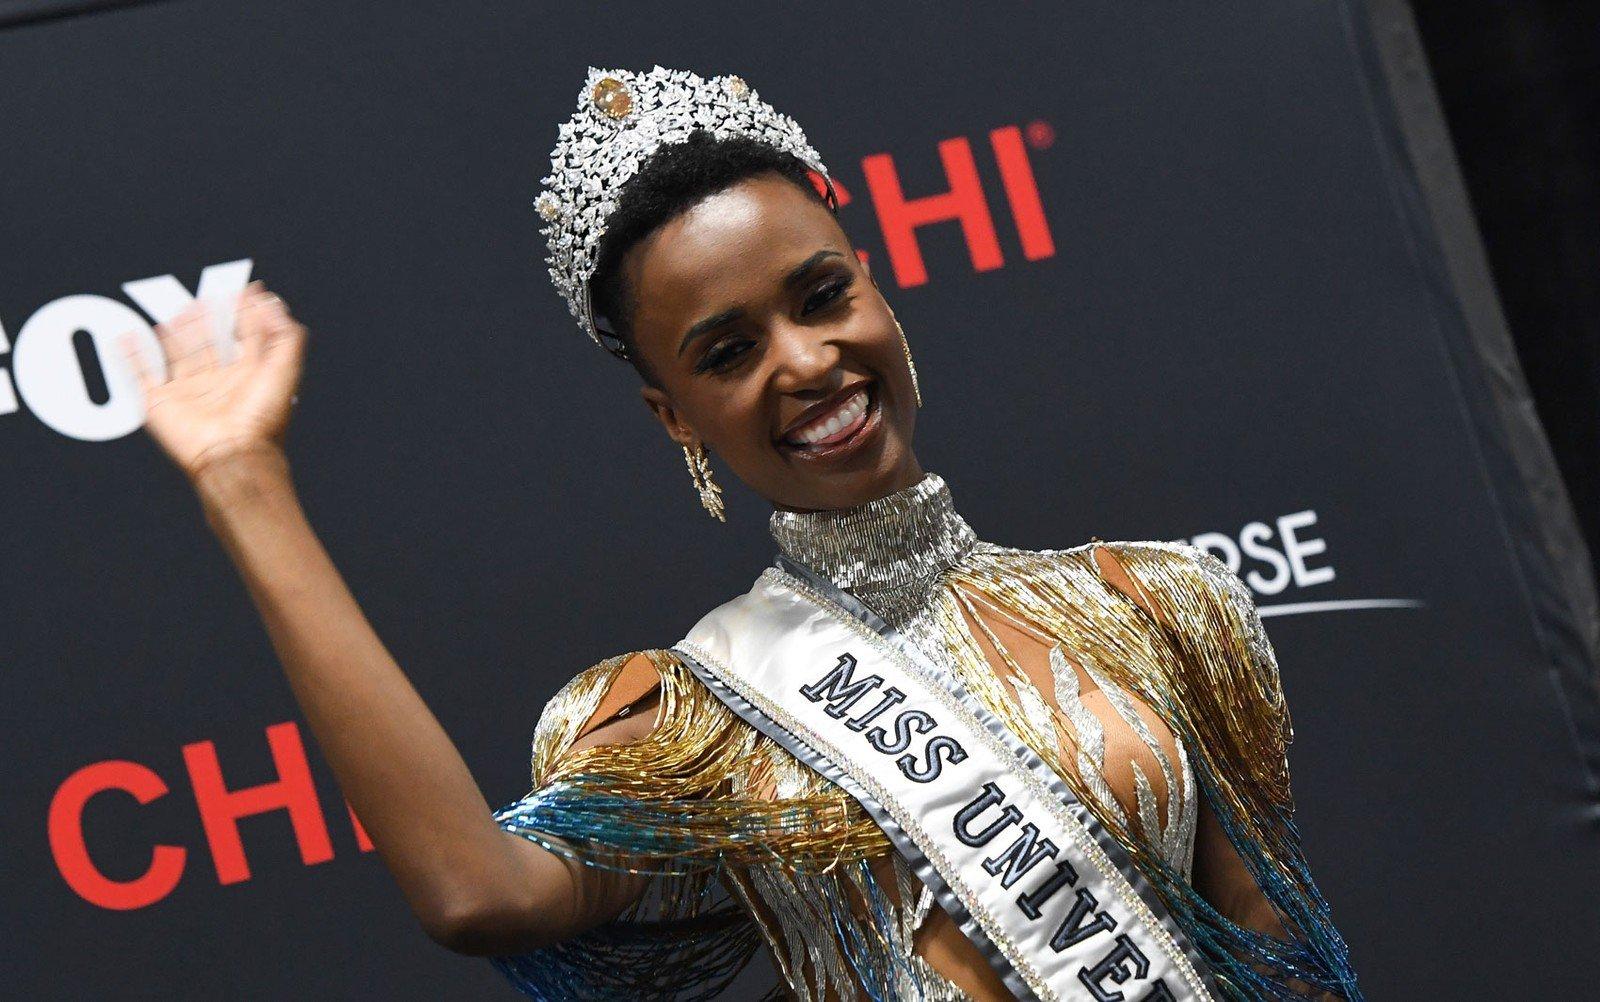 Sul-africana é coroada Miss Universo 2019 e fala contra o racismo